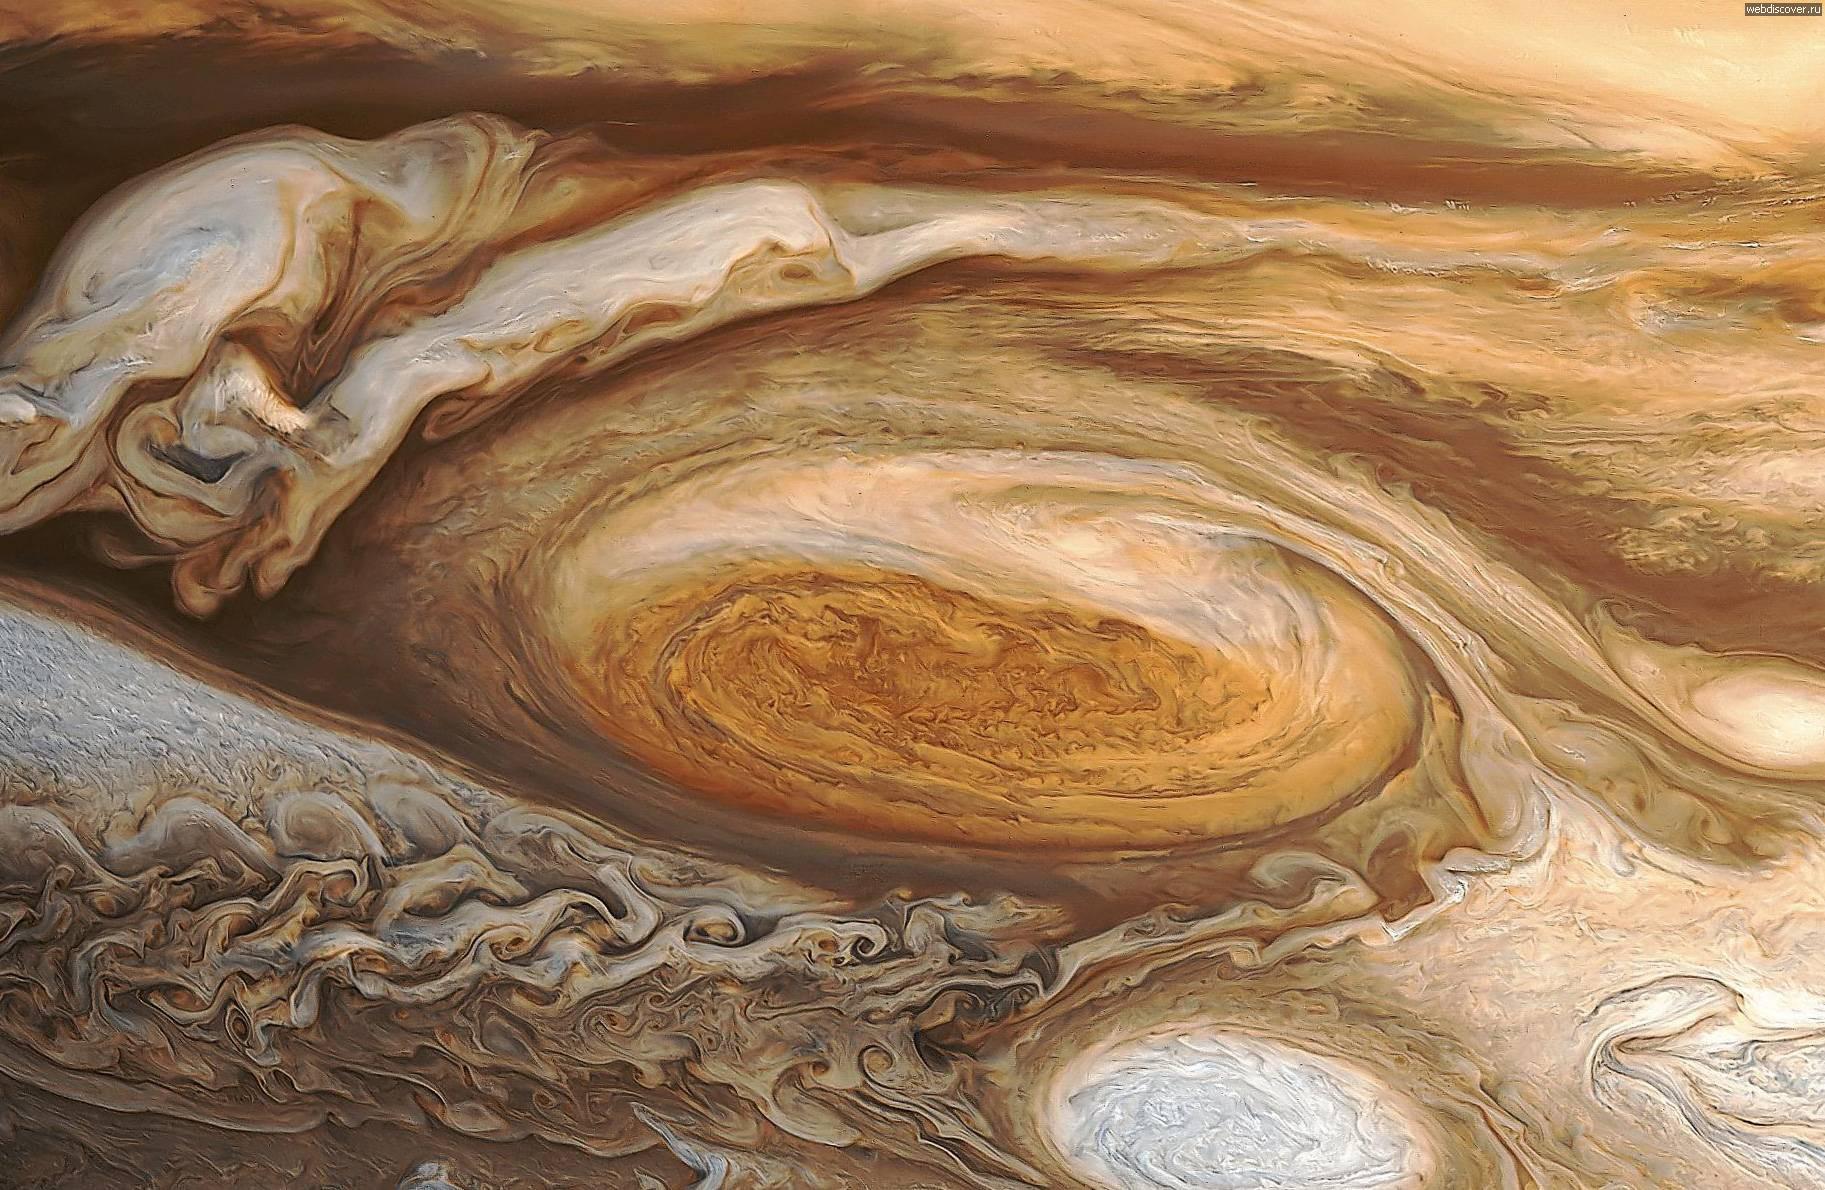 planeti-foto-krupnim-planom